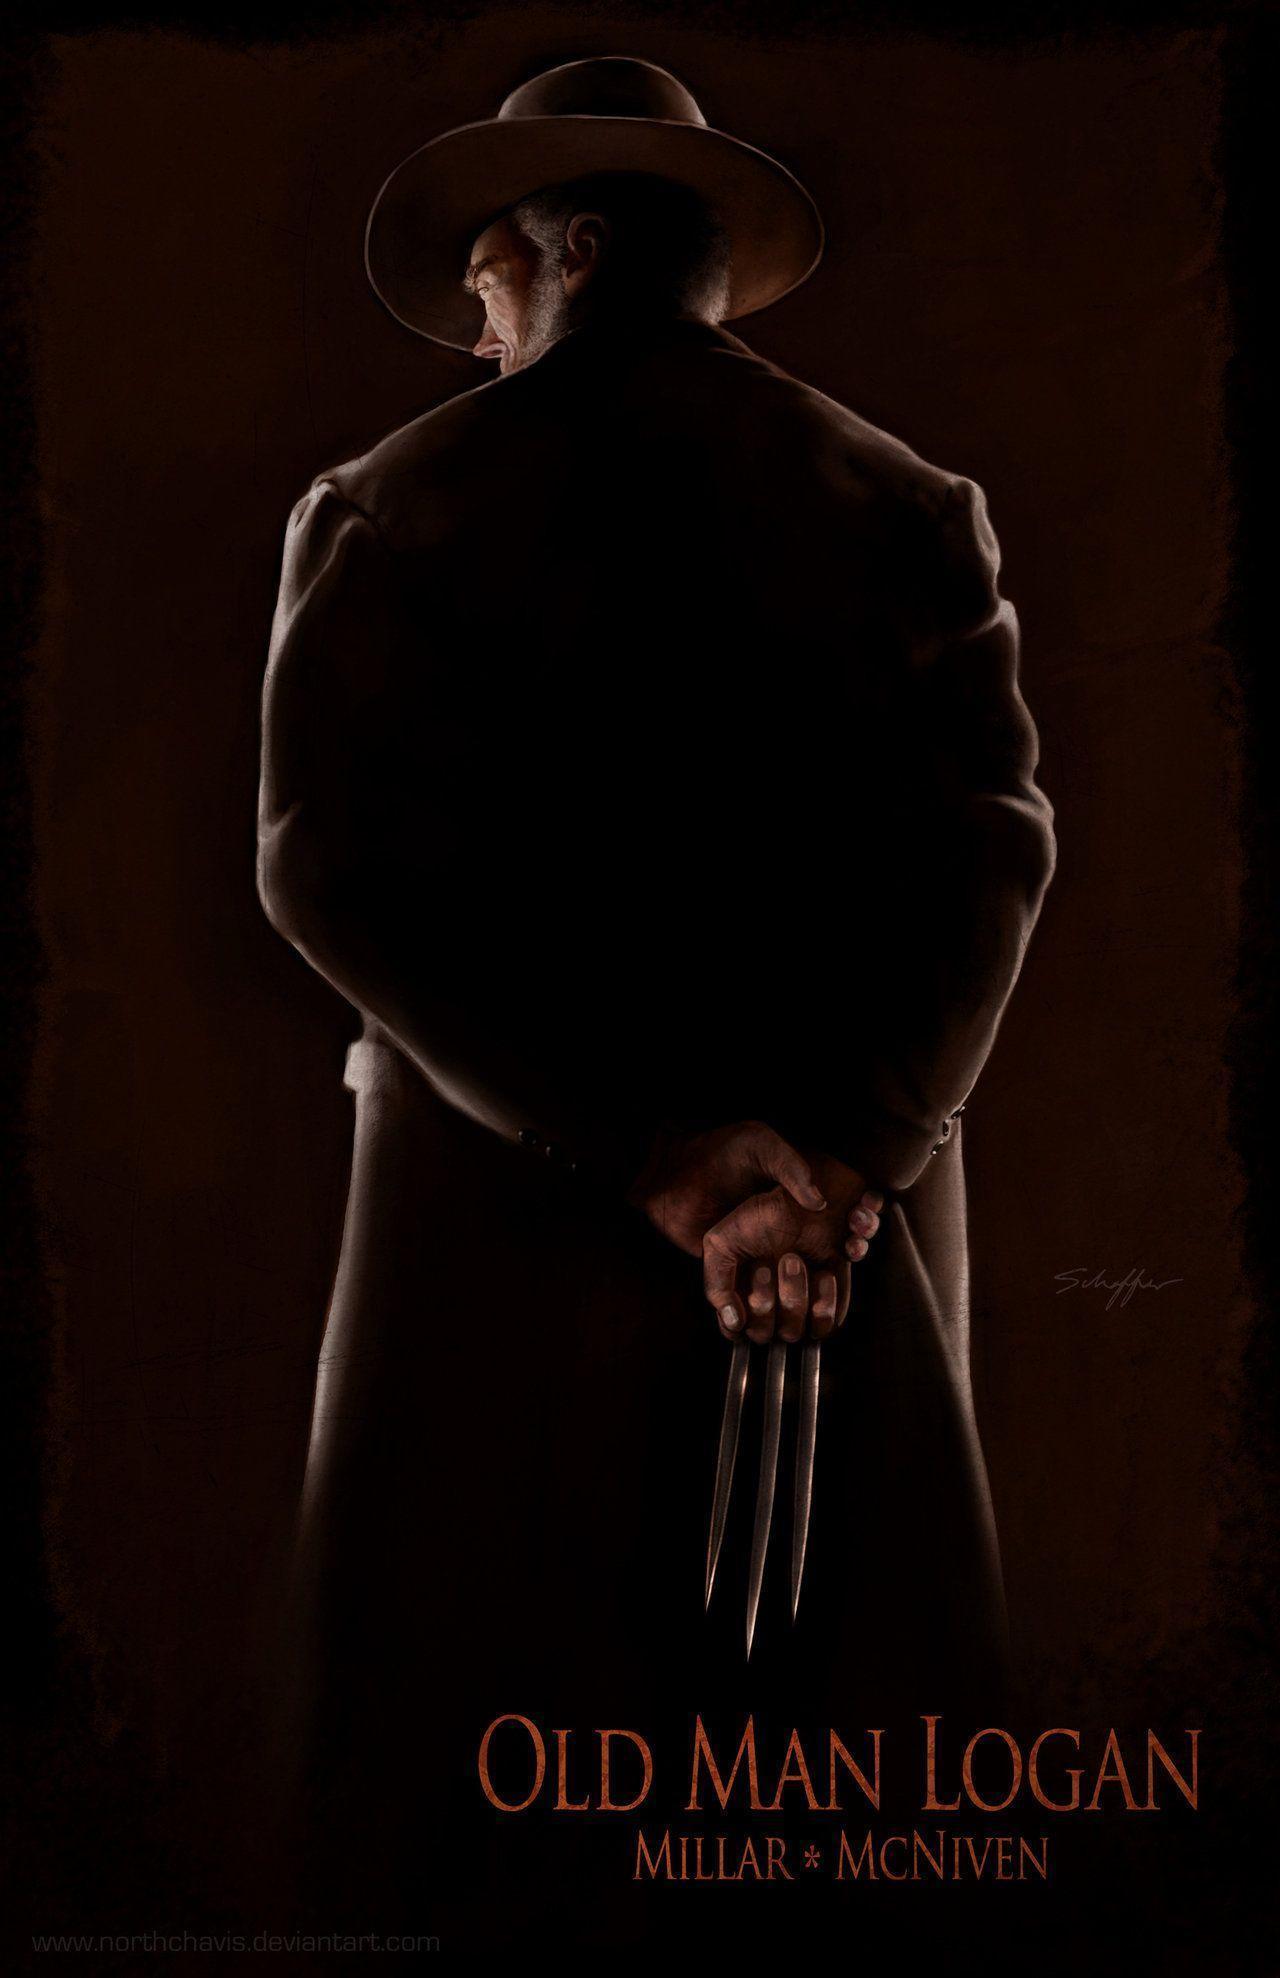 Old Man Logan by StephenSchaffer on DeviantArt